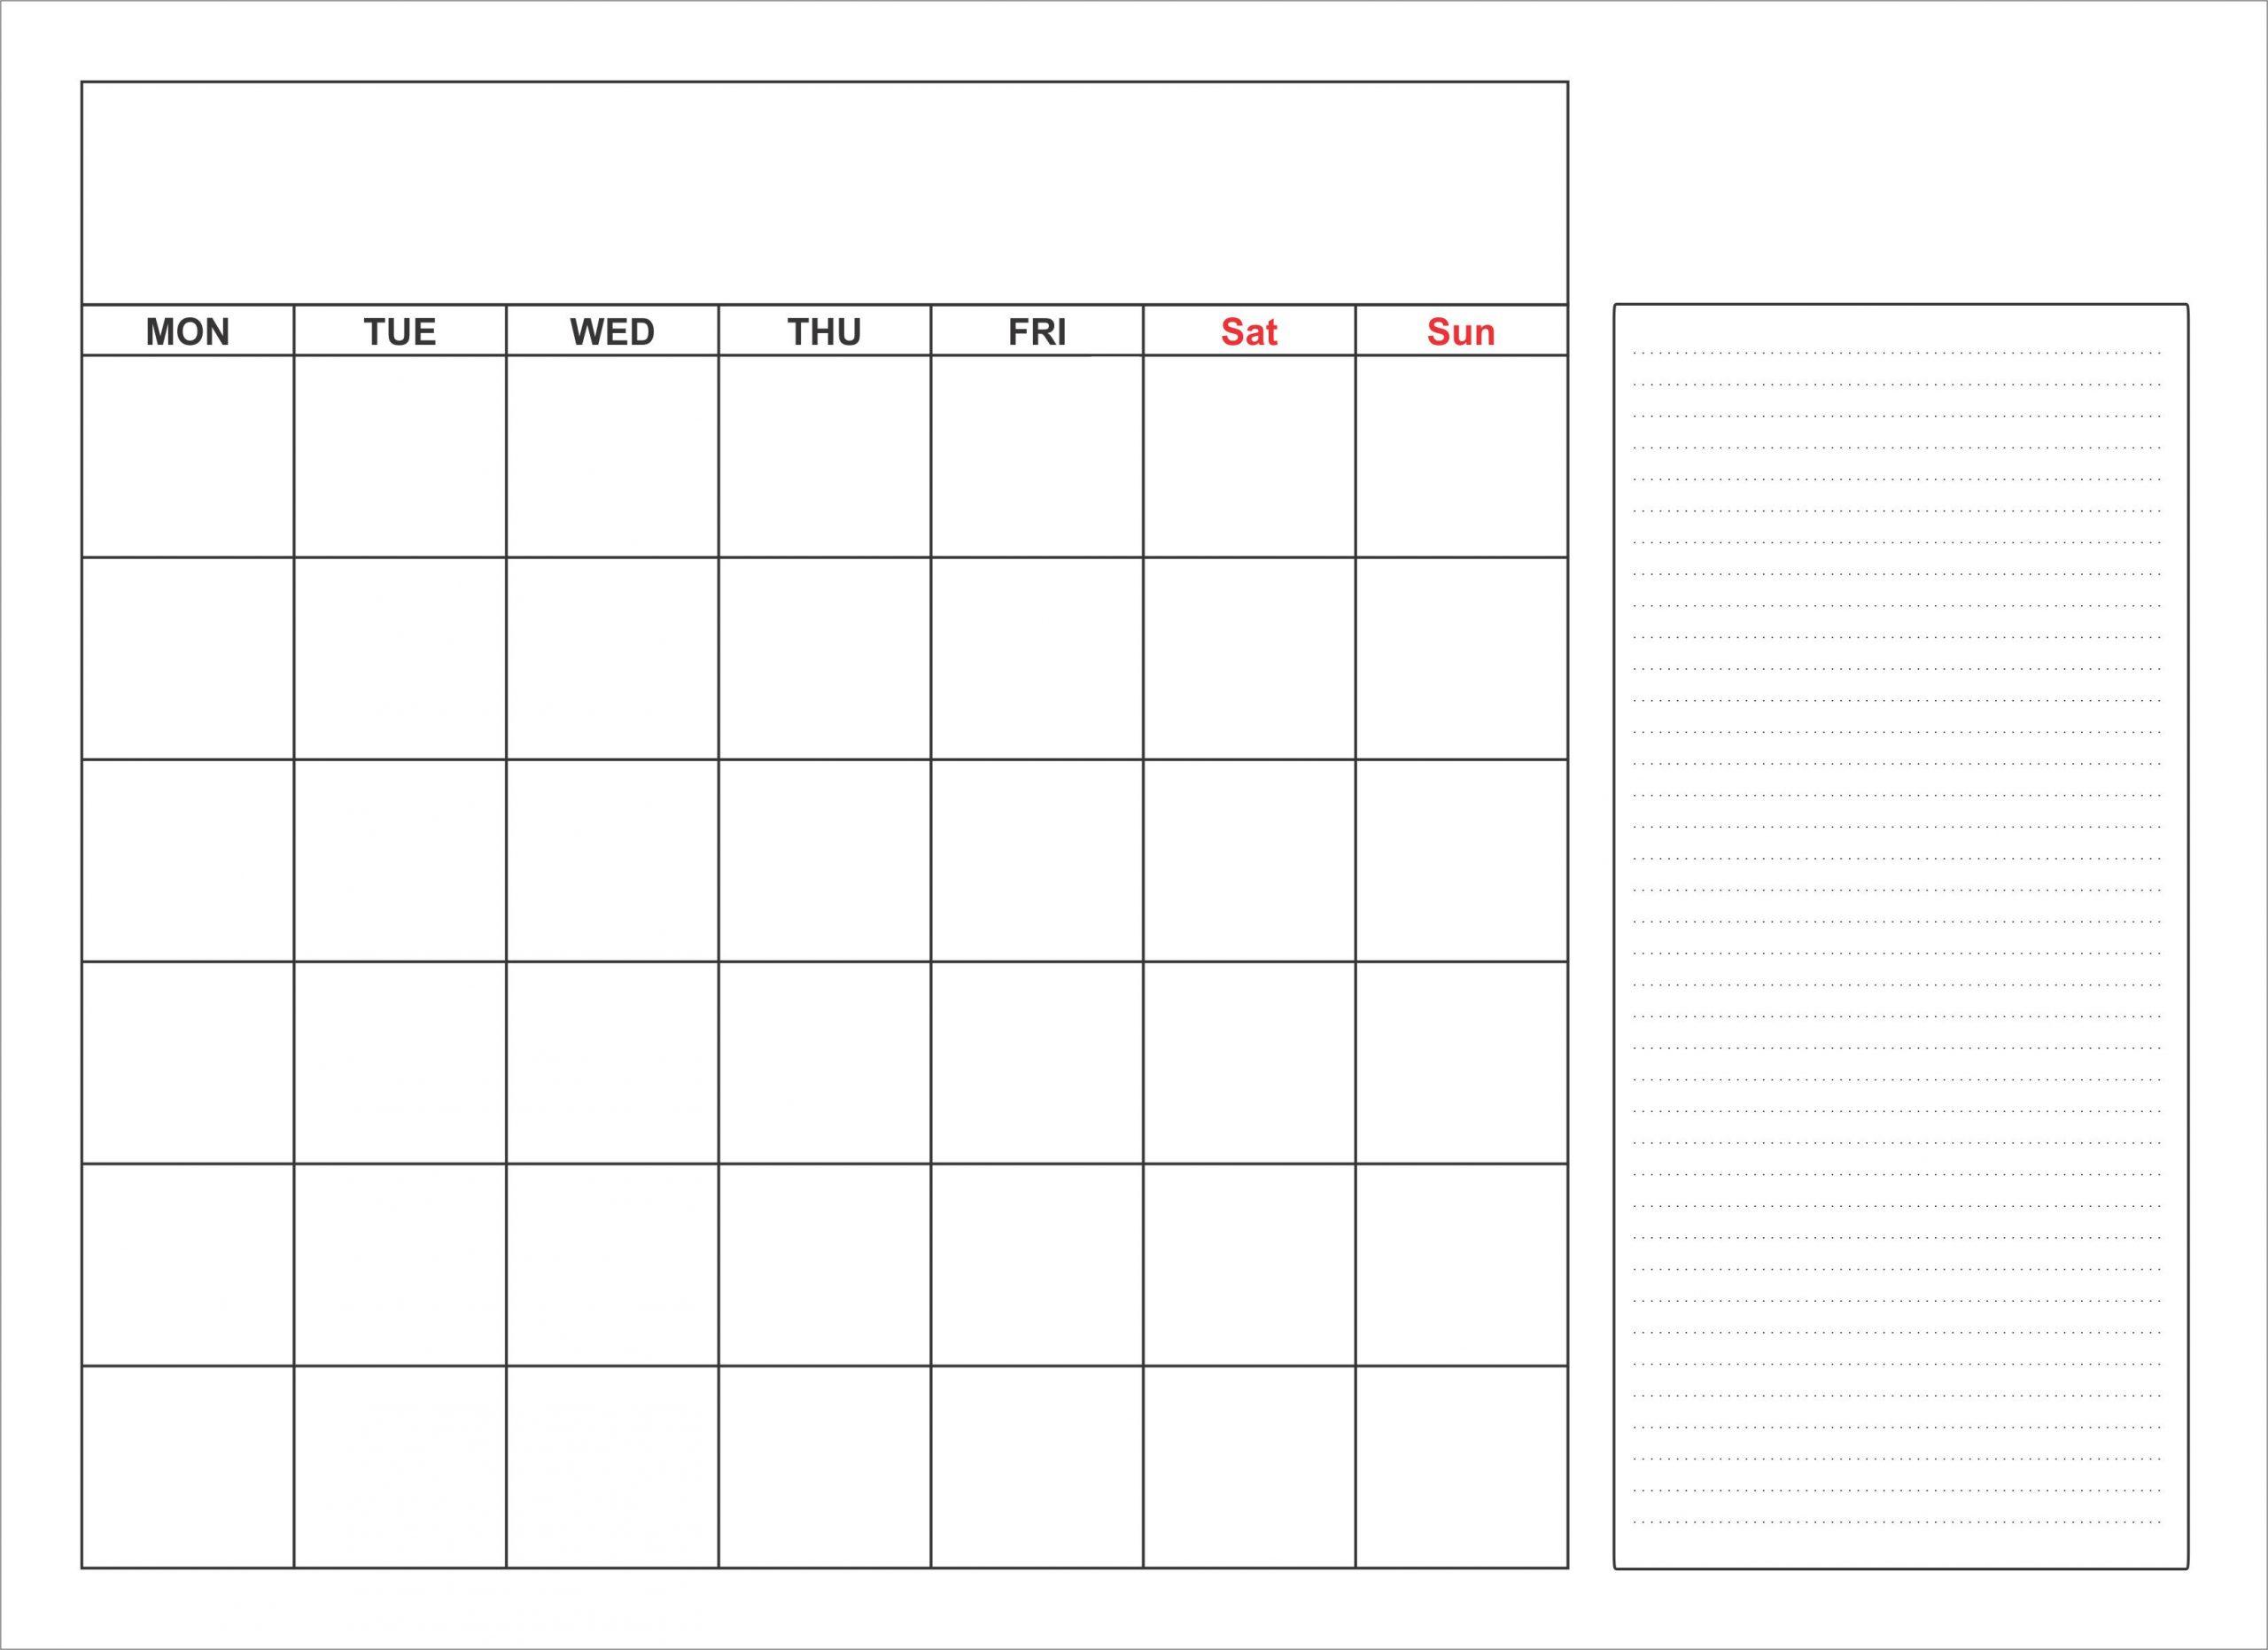 Blank Calendar Template Monthly In Word, Pdf, Excel